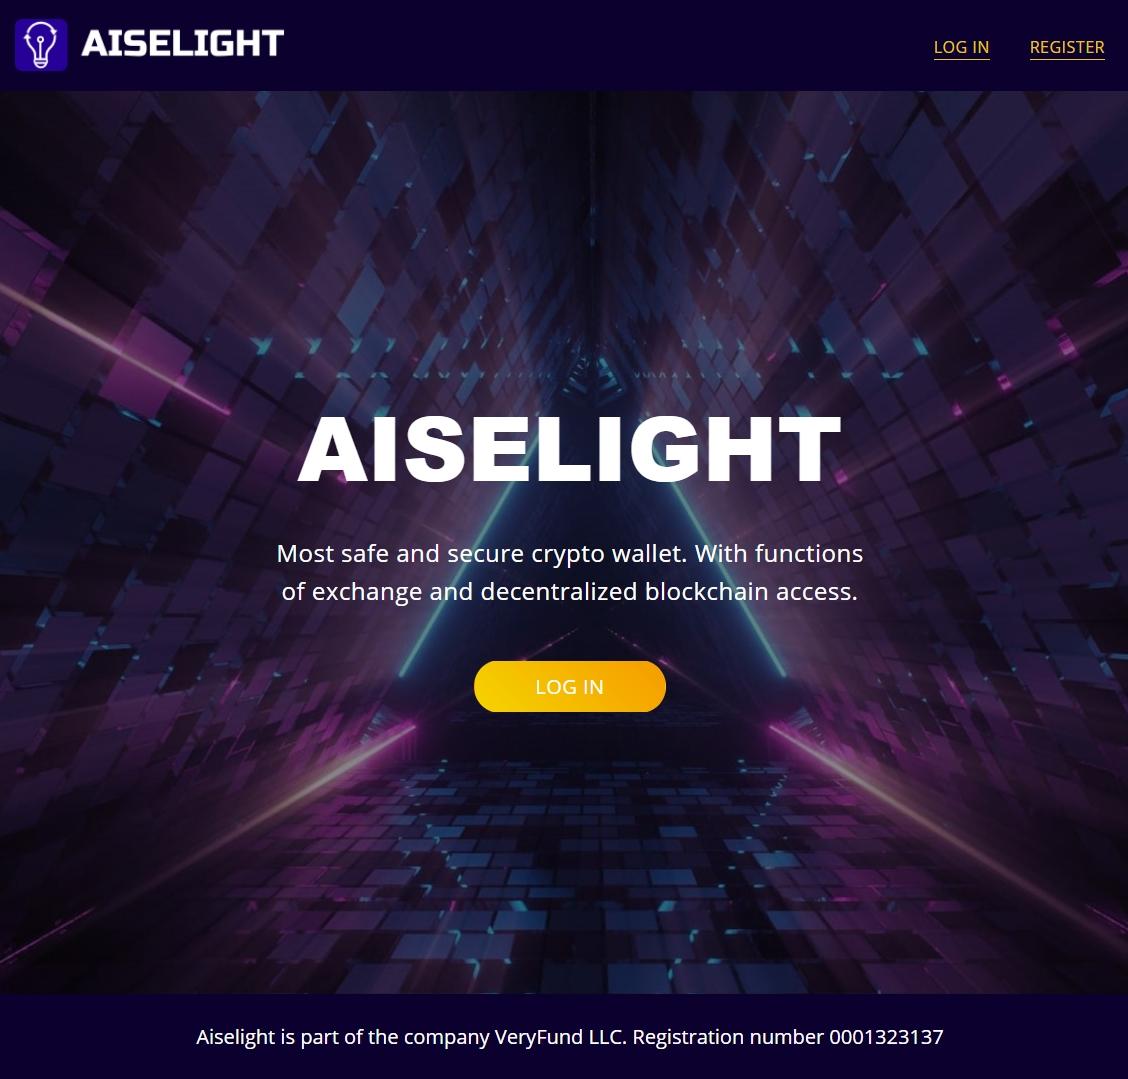 Сайт Aiselight